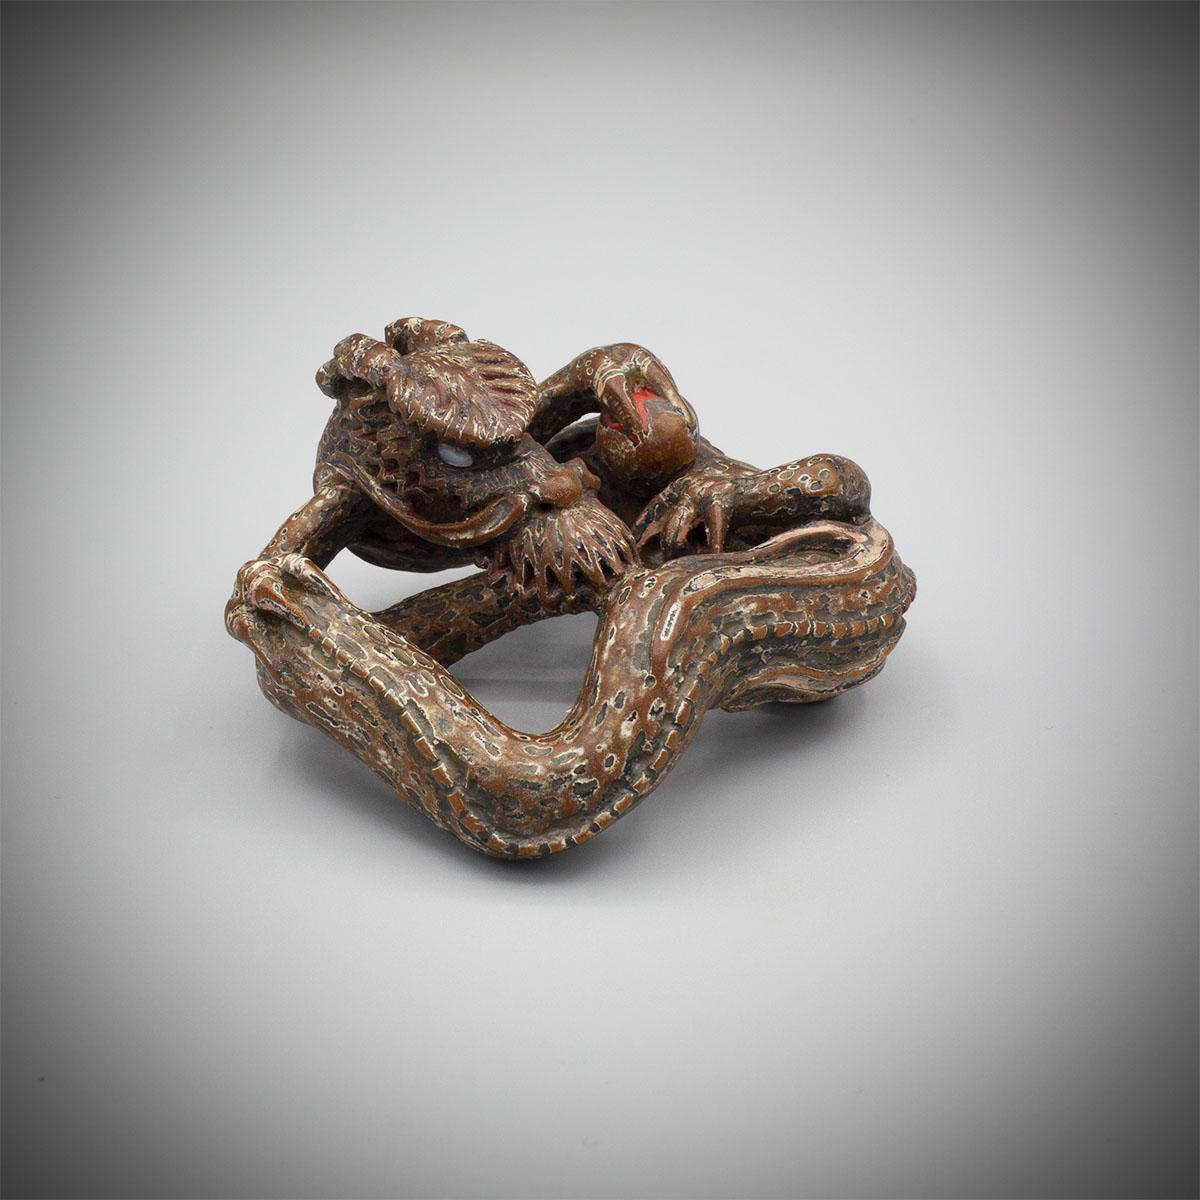 Saishiki Wood Netsuke of a Three-Clawed Dragon in the Manner of Yoshimura Shuzan, MR3326_v1